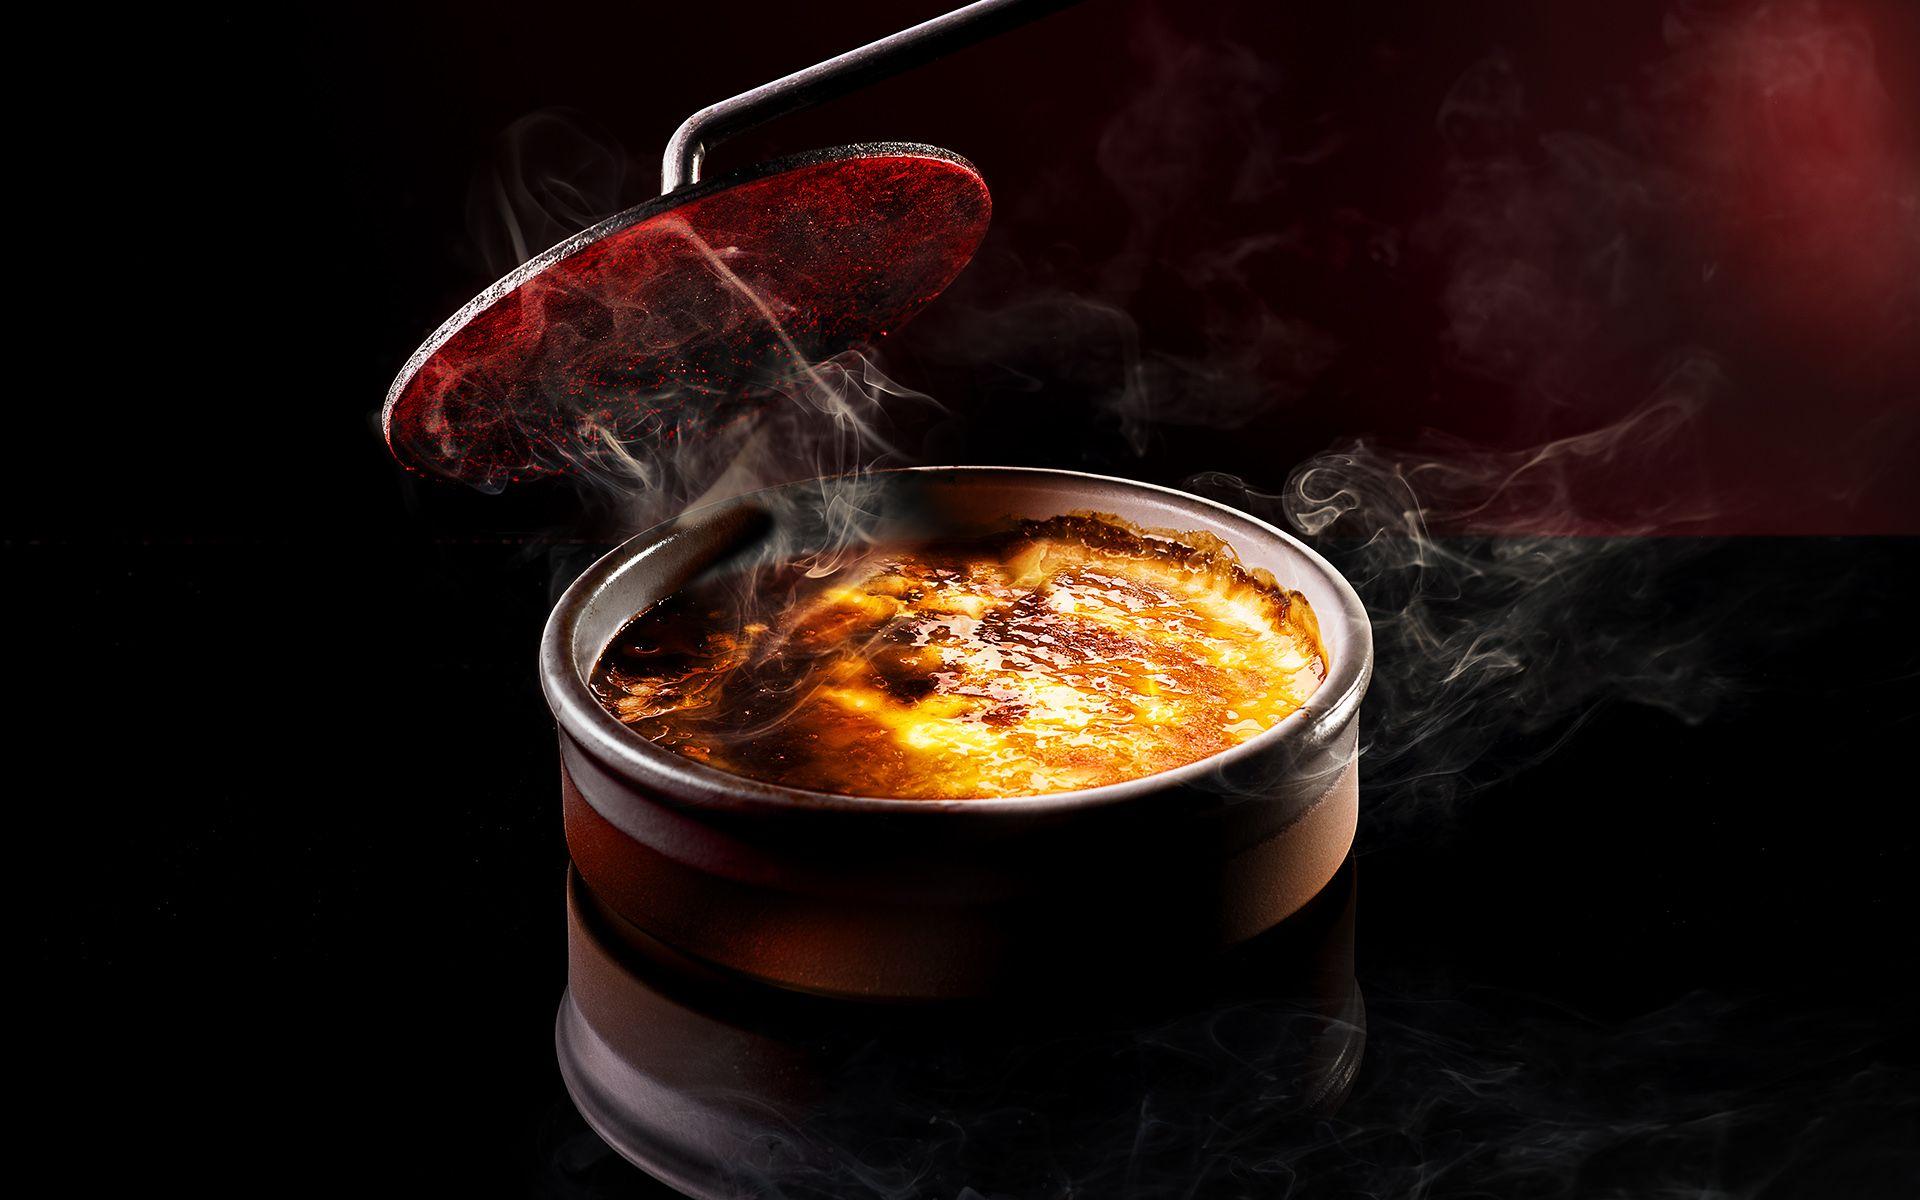 Crême brulée with caramelized sugar